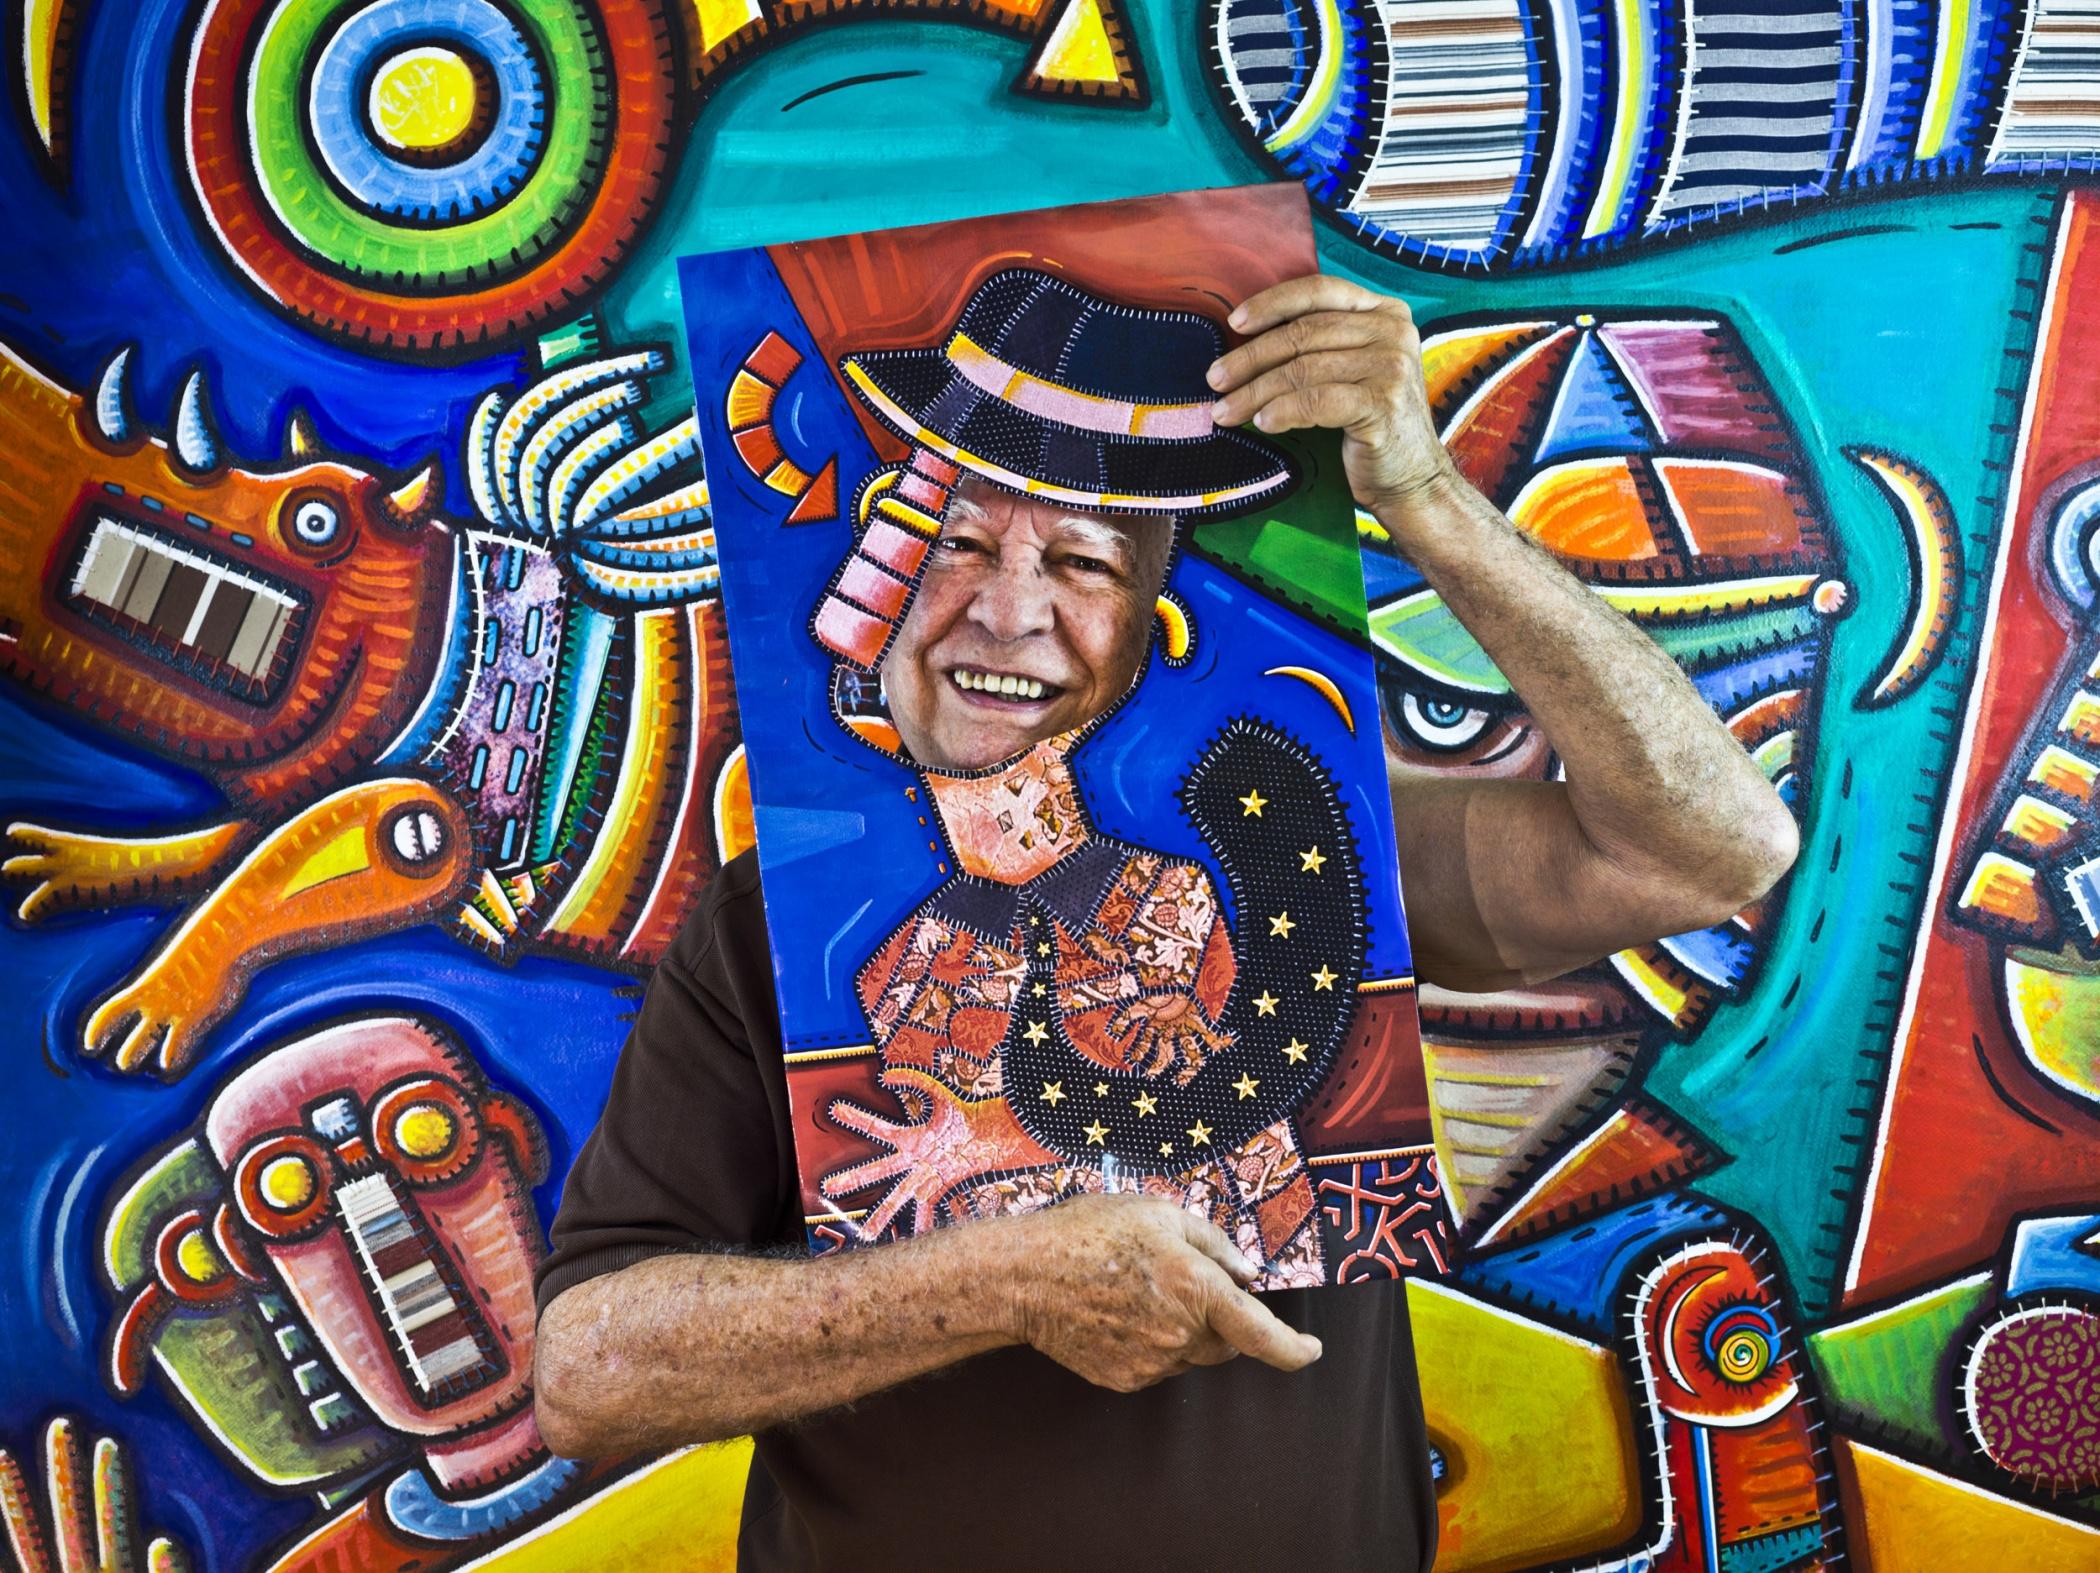 Alfredo Sosabravo, painter - Illuminated Cuba - Hector Garrido, Aerial and human photography